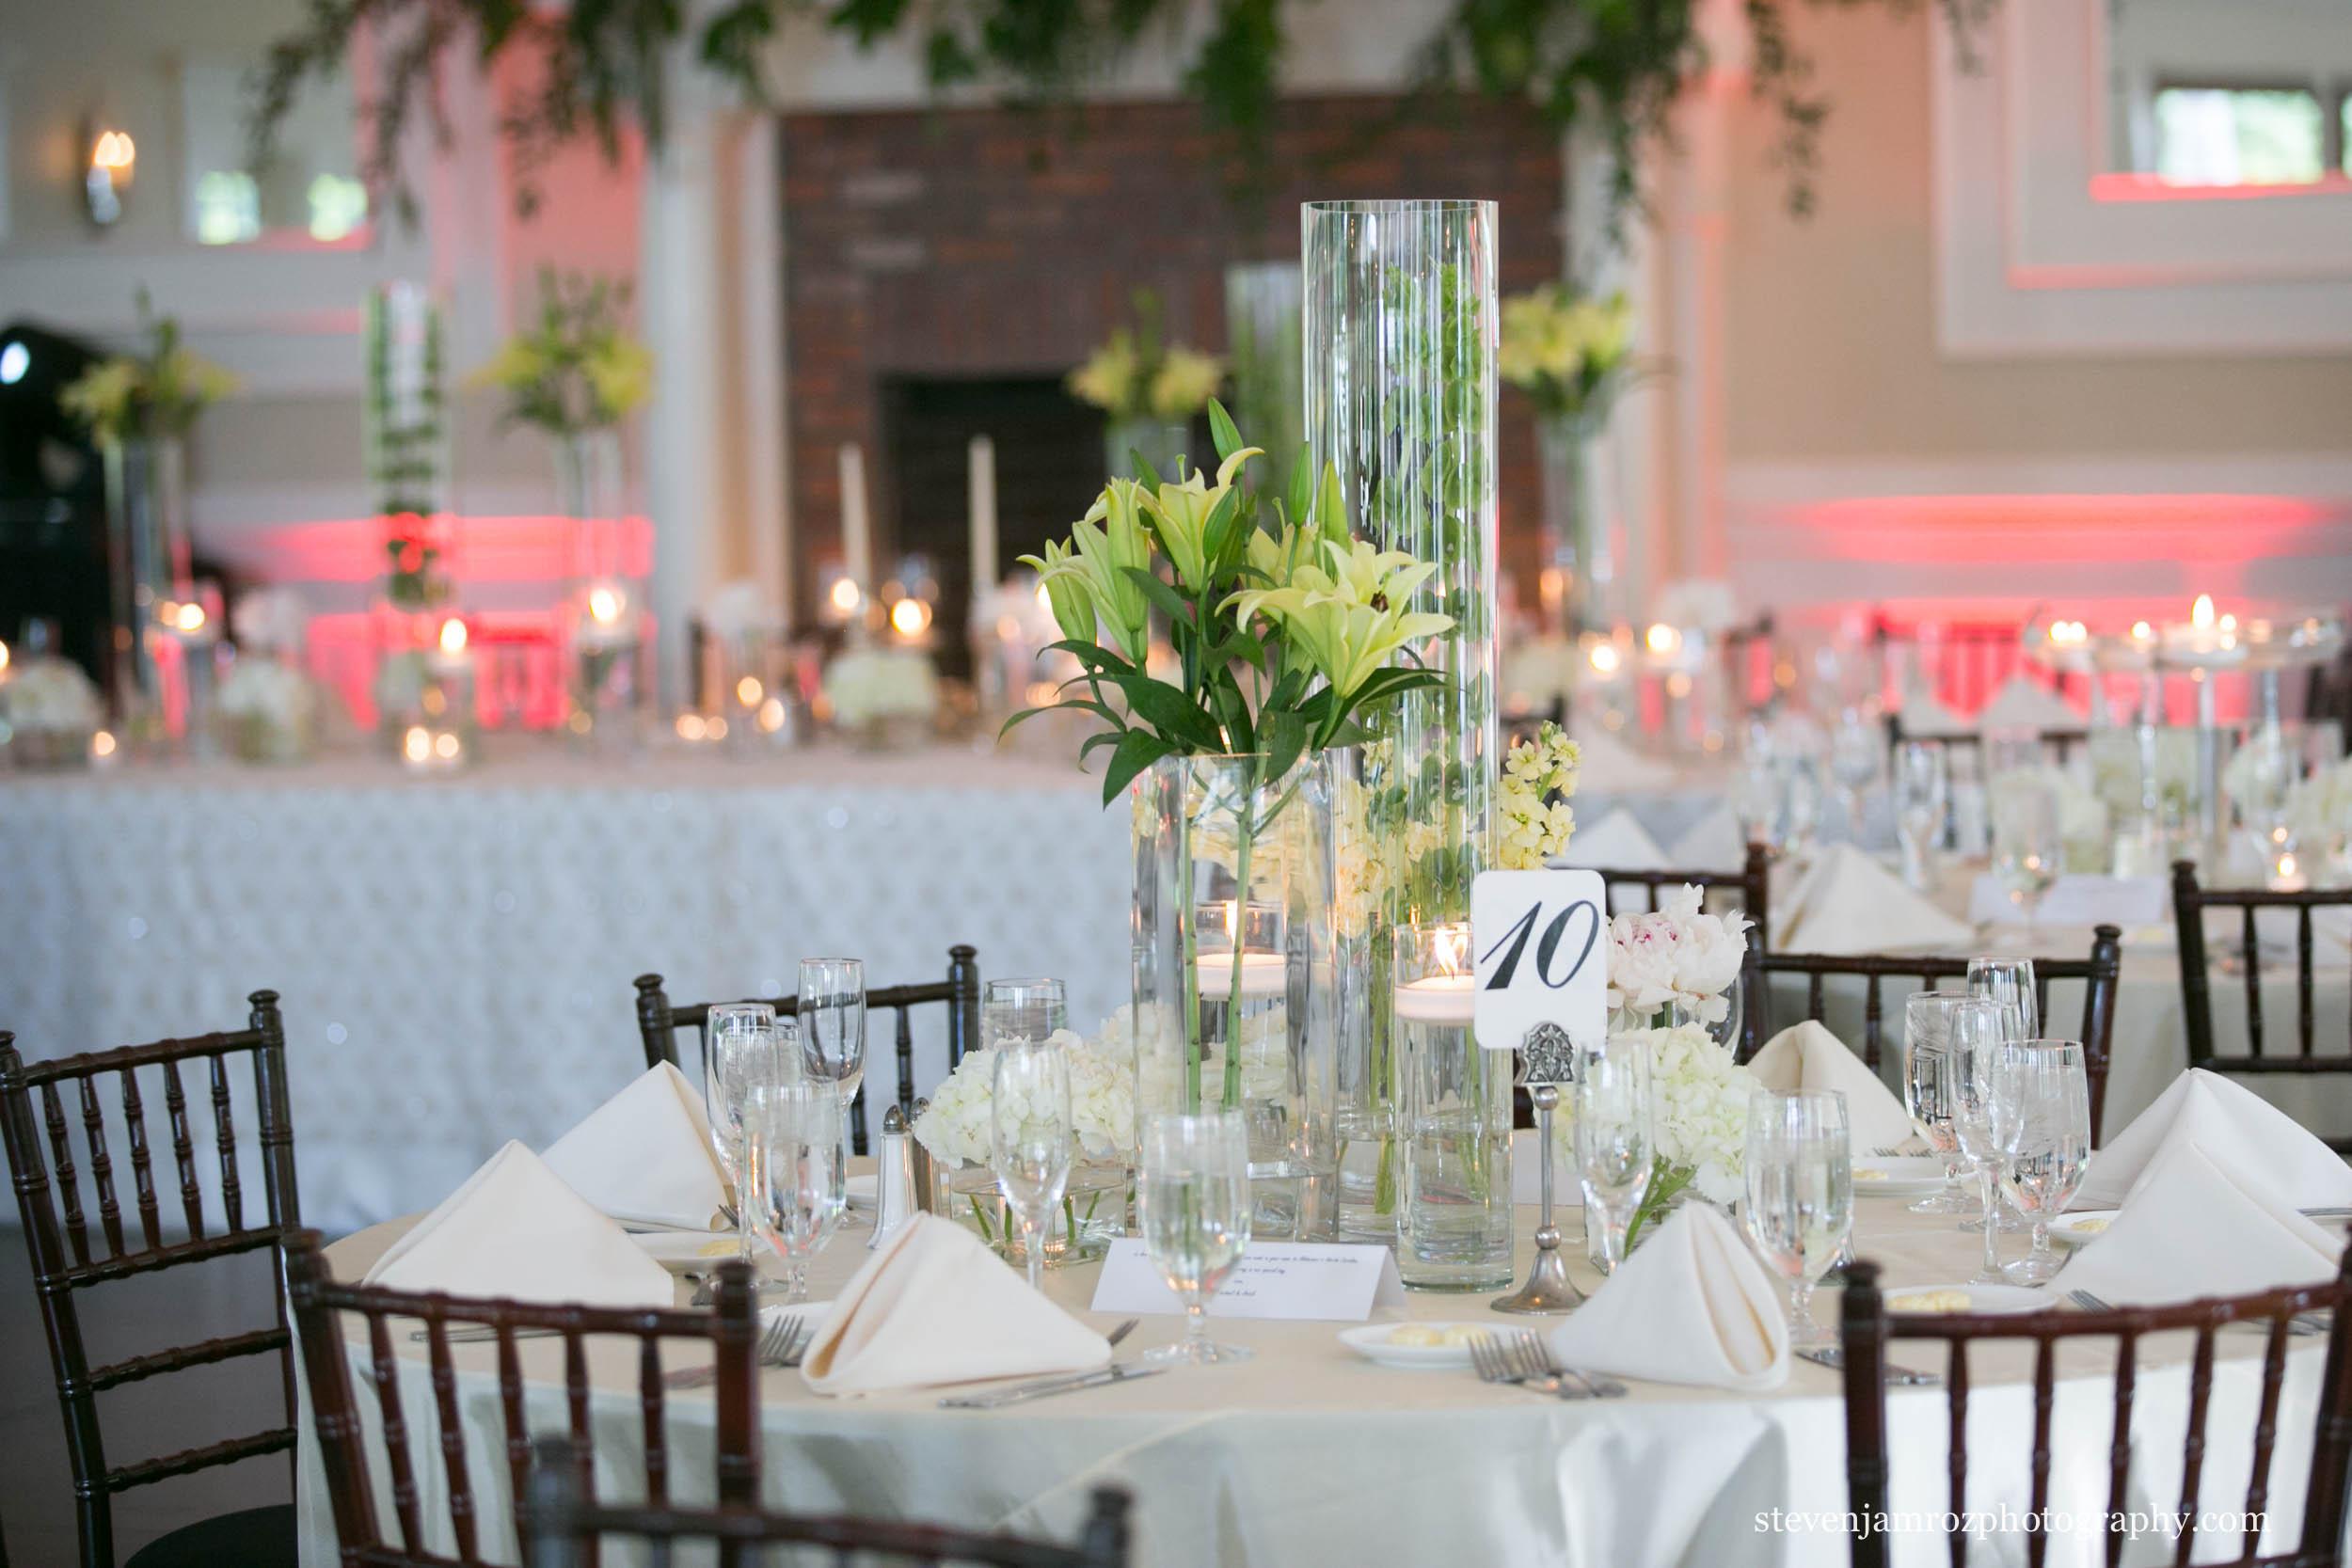 fuquay-varina-wedding-venues-the-highgrove-0901.jpg